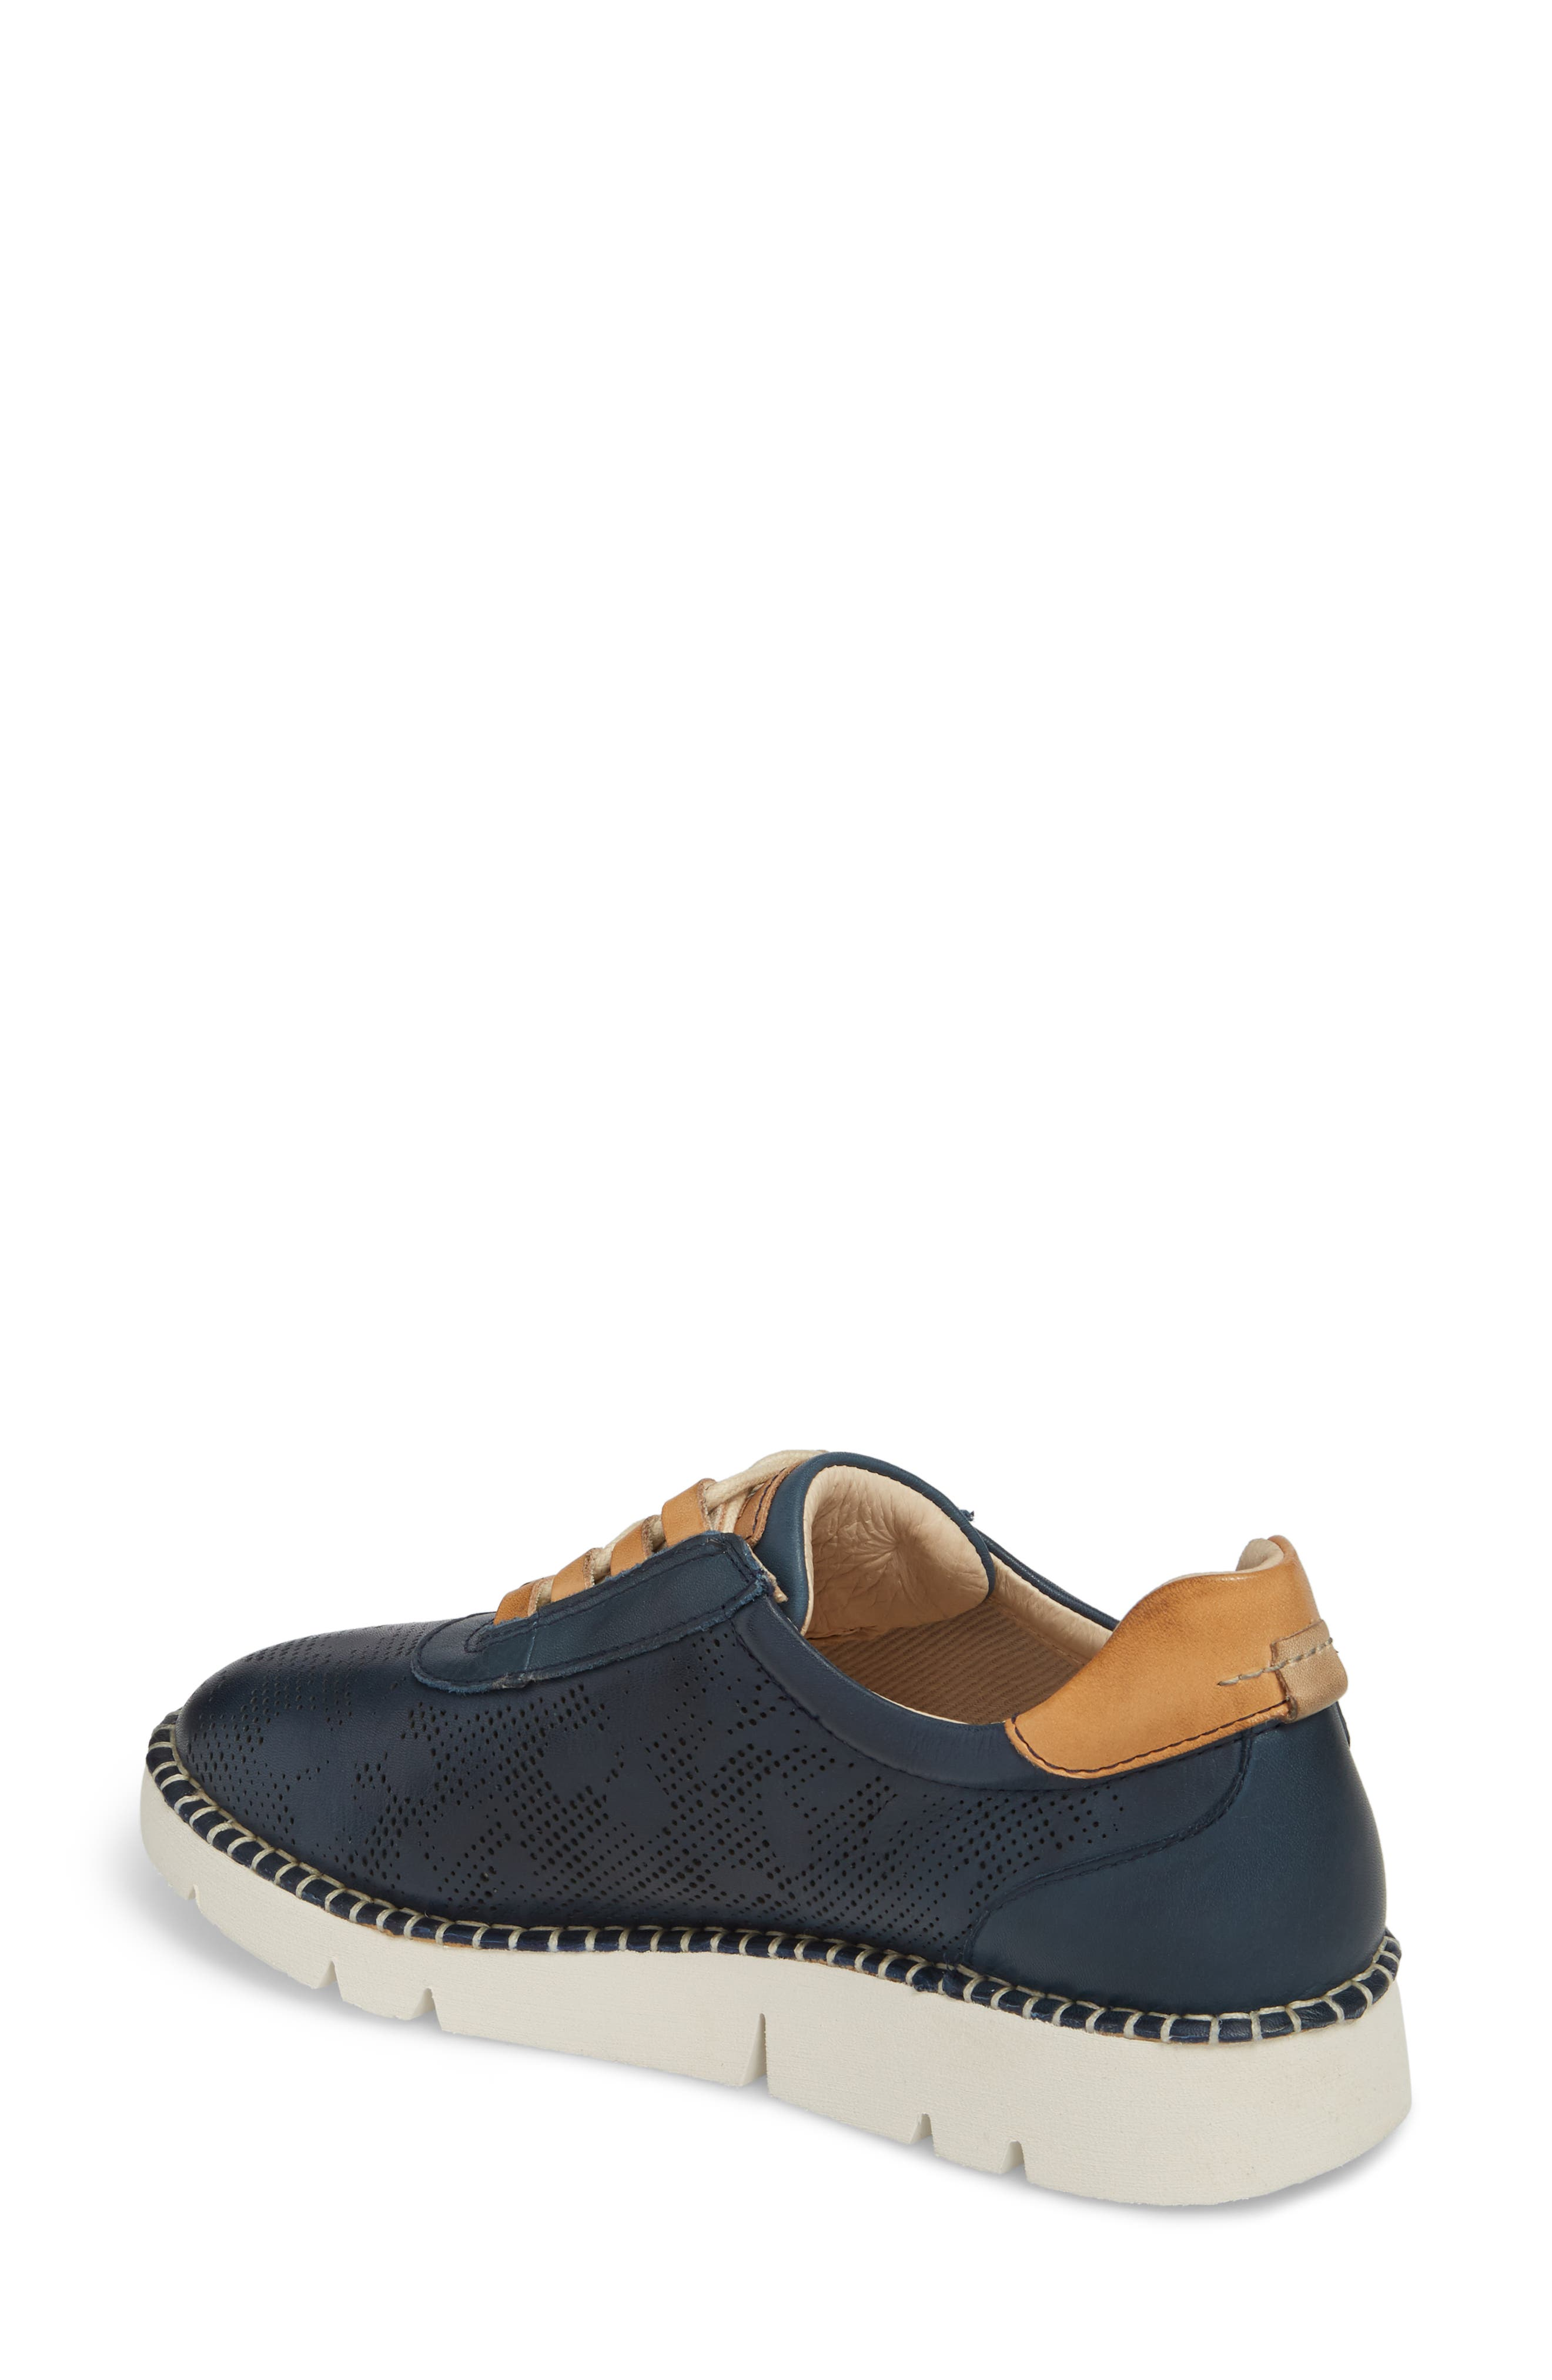 Vera Sneaker,                             Alternate thumbnail 2, color,                             OCEAN LEATHER